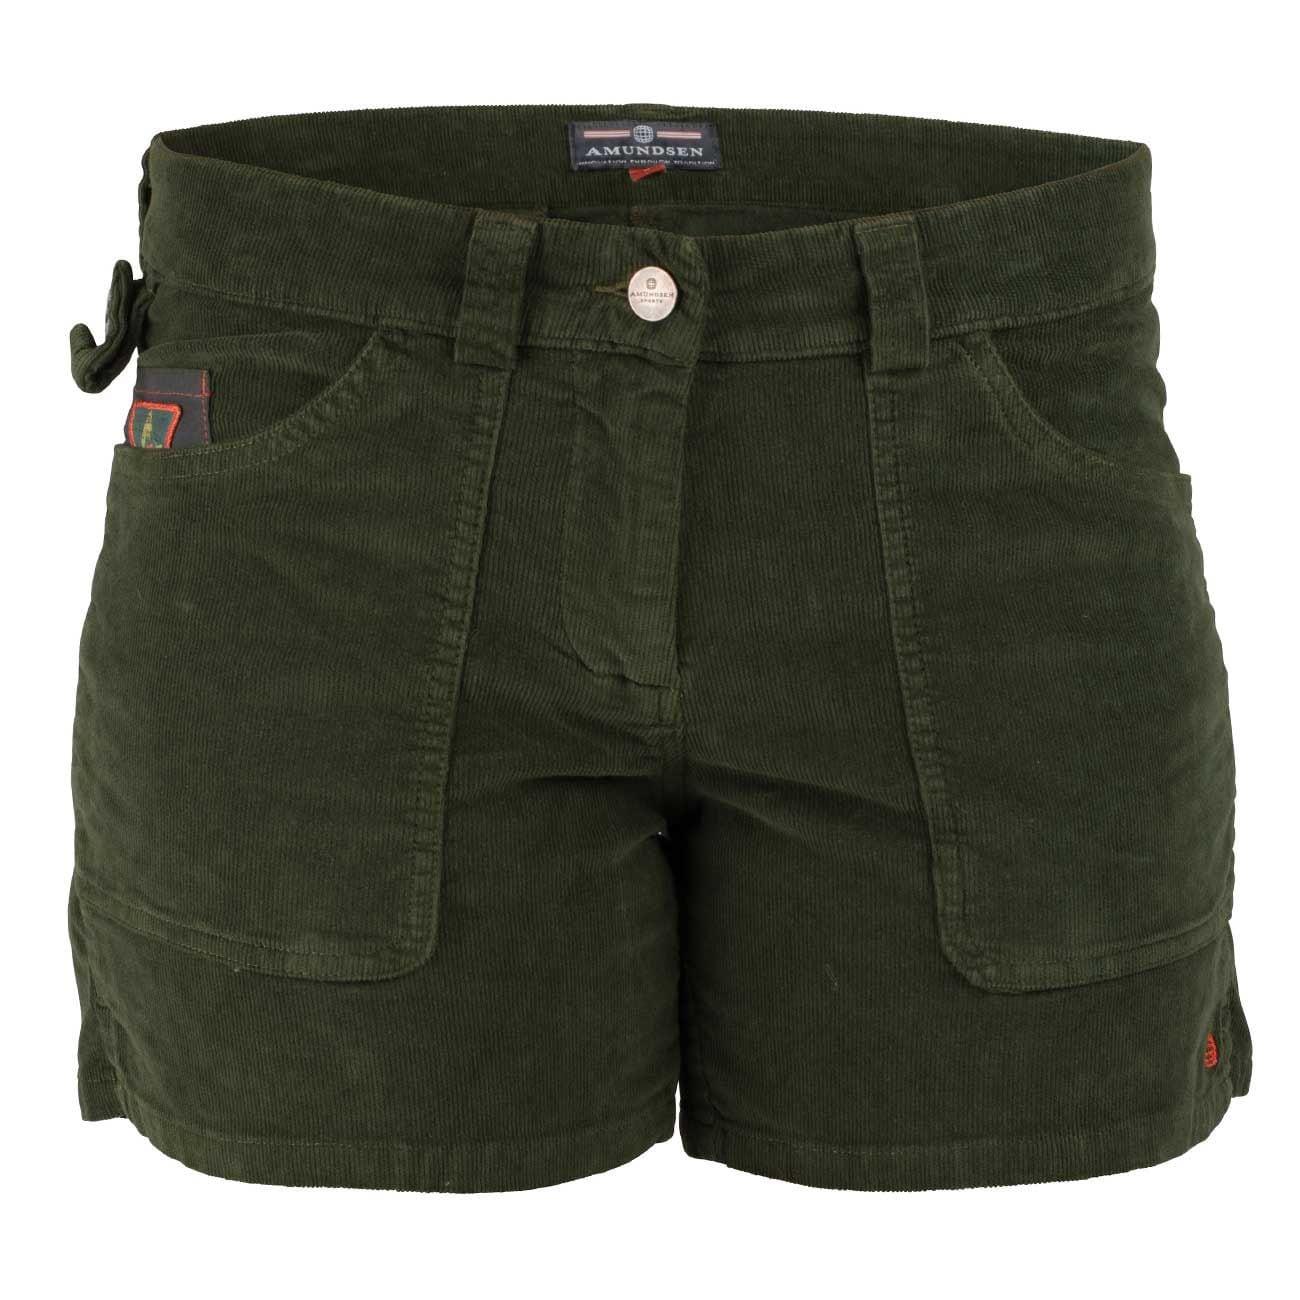 Amundsen Sports 5incher Concord Garment Dyed, W`s, Shorts